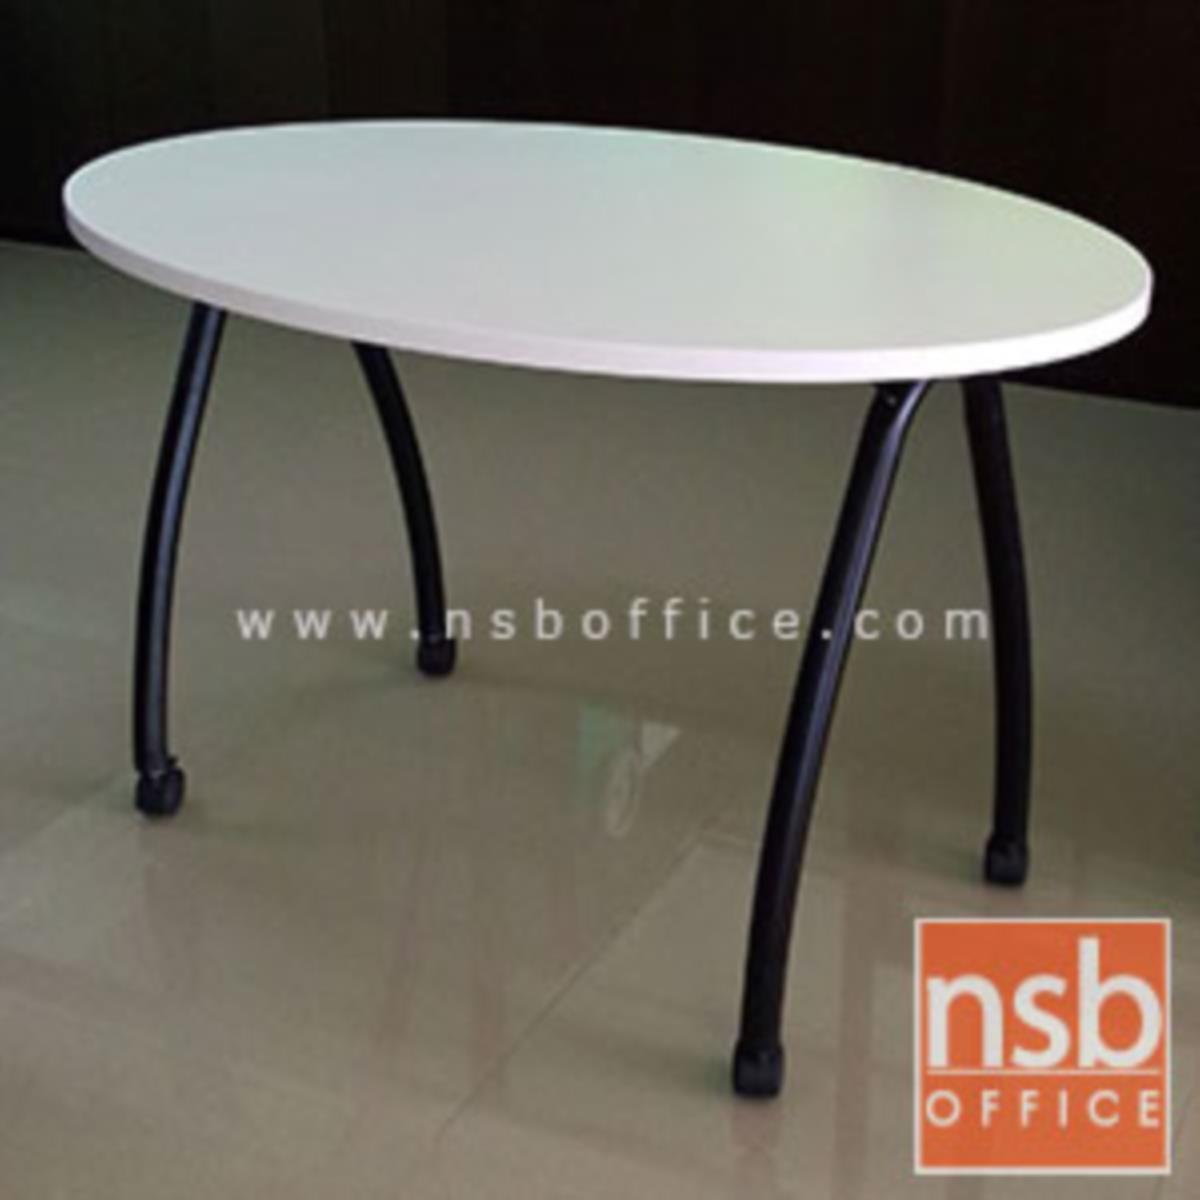 A18A030:โต๊ะทำงานทรงวงรี ขนาด 120W*75H cm.    ขาเหล็กโค้งล้อเลื่อน